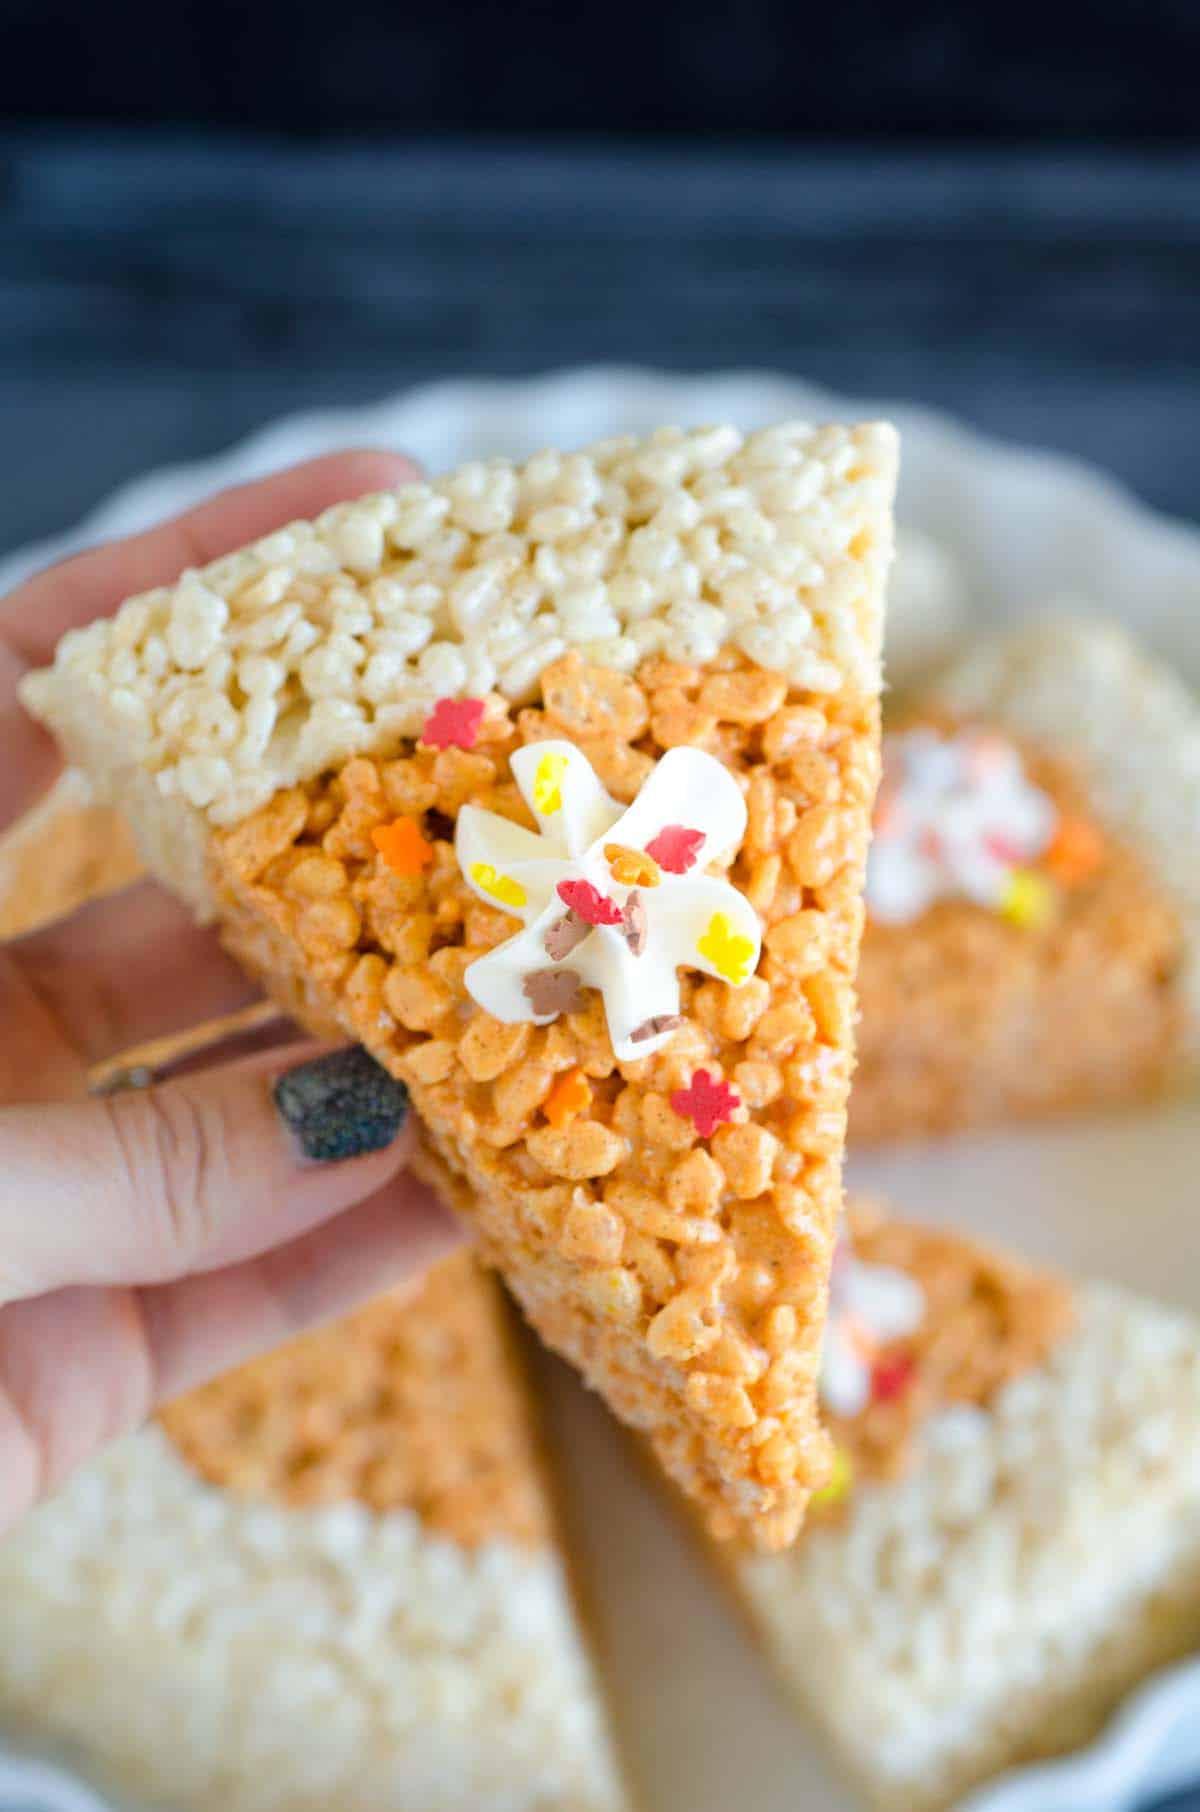 rice krispies treat in shape of pumpkin pie